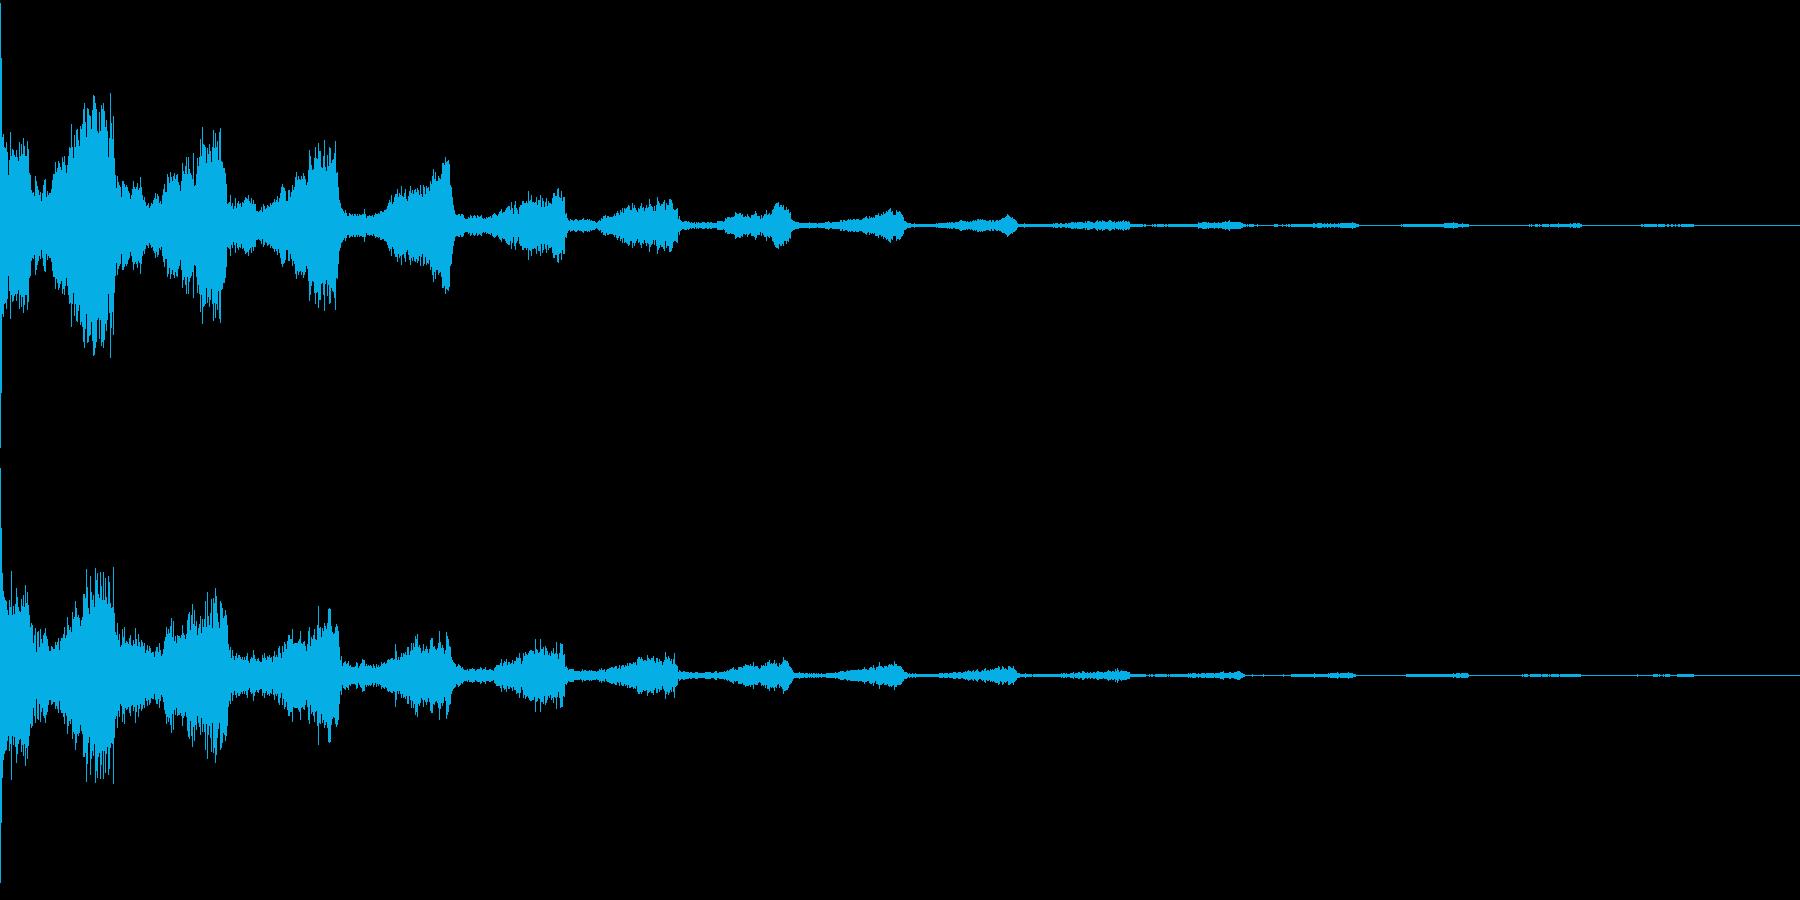 EDM コードインパクト 音楽制作用の再生済みの波形